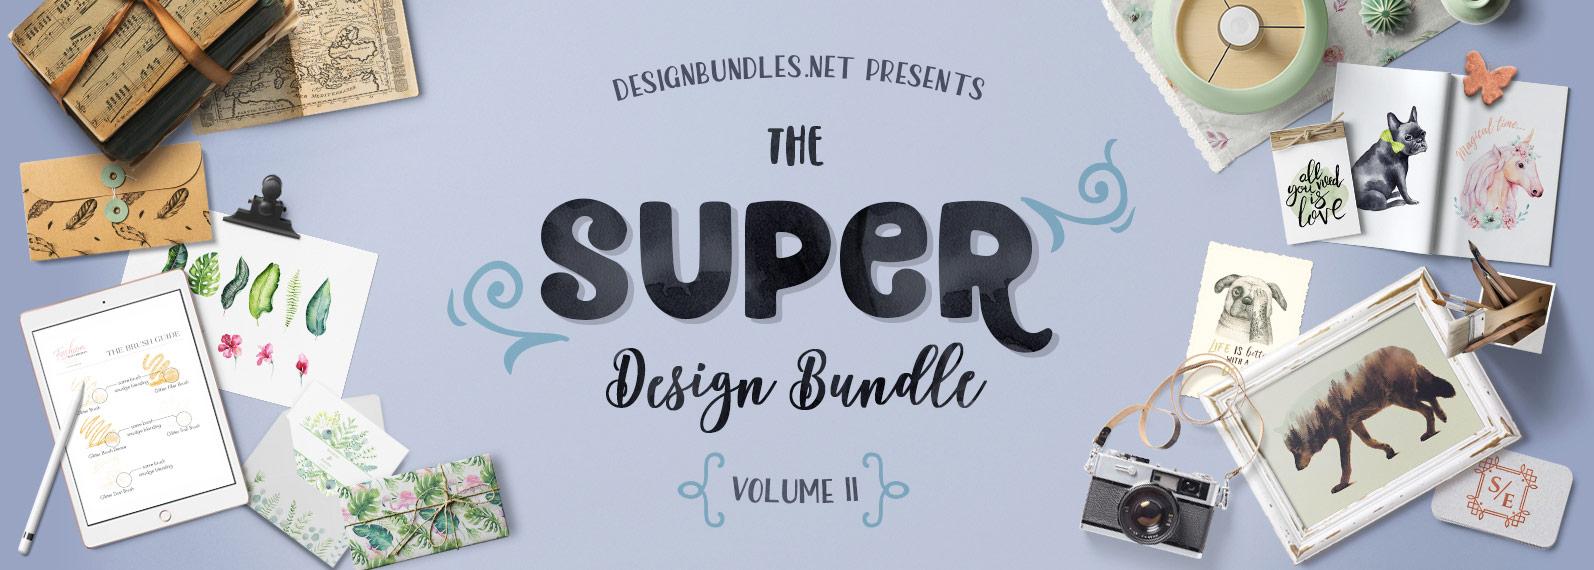 The Super Design Bundle Vol II Cover